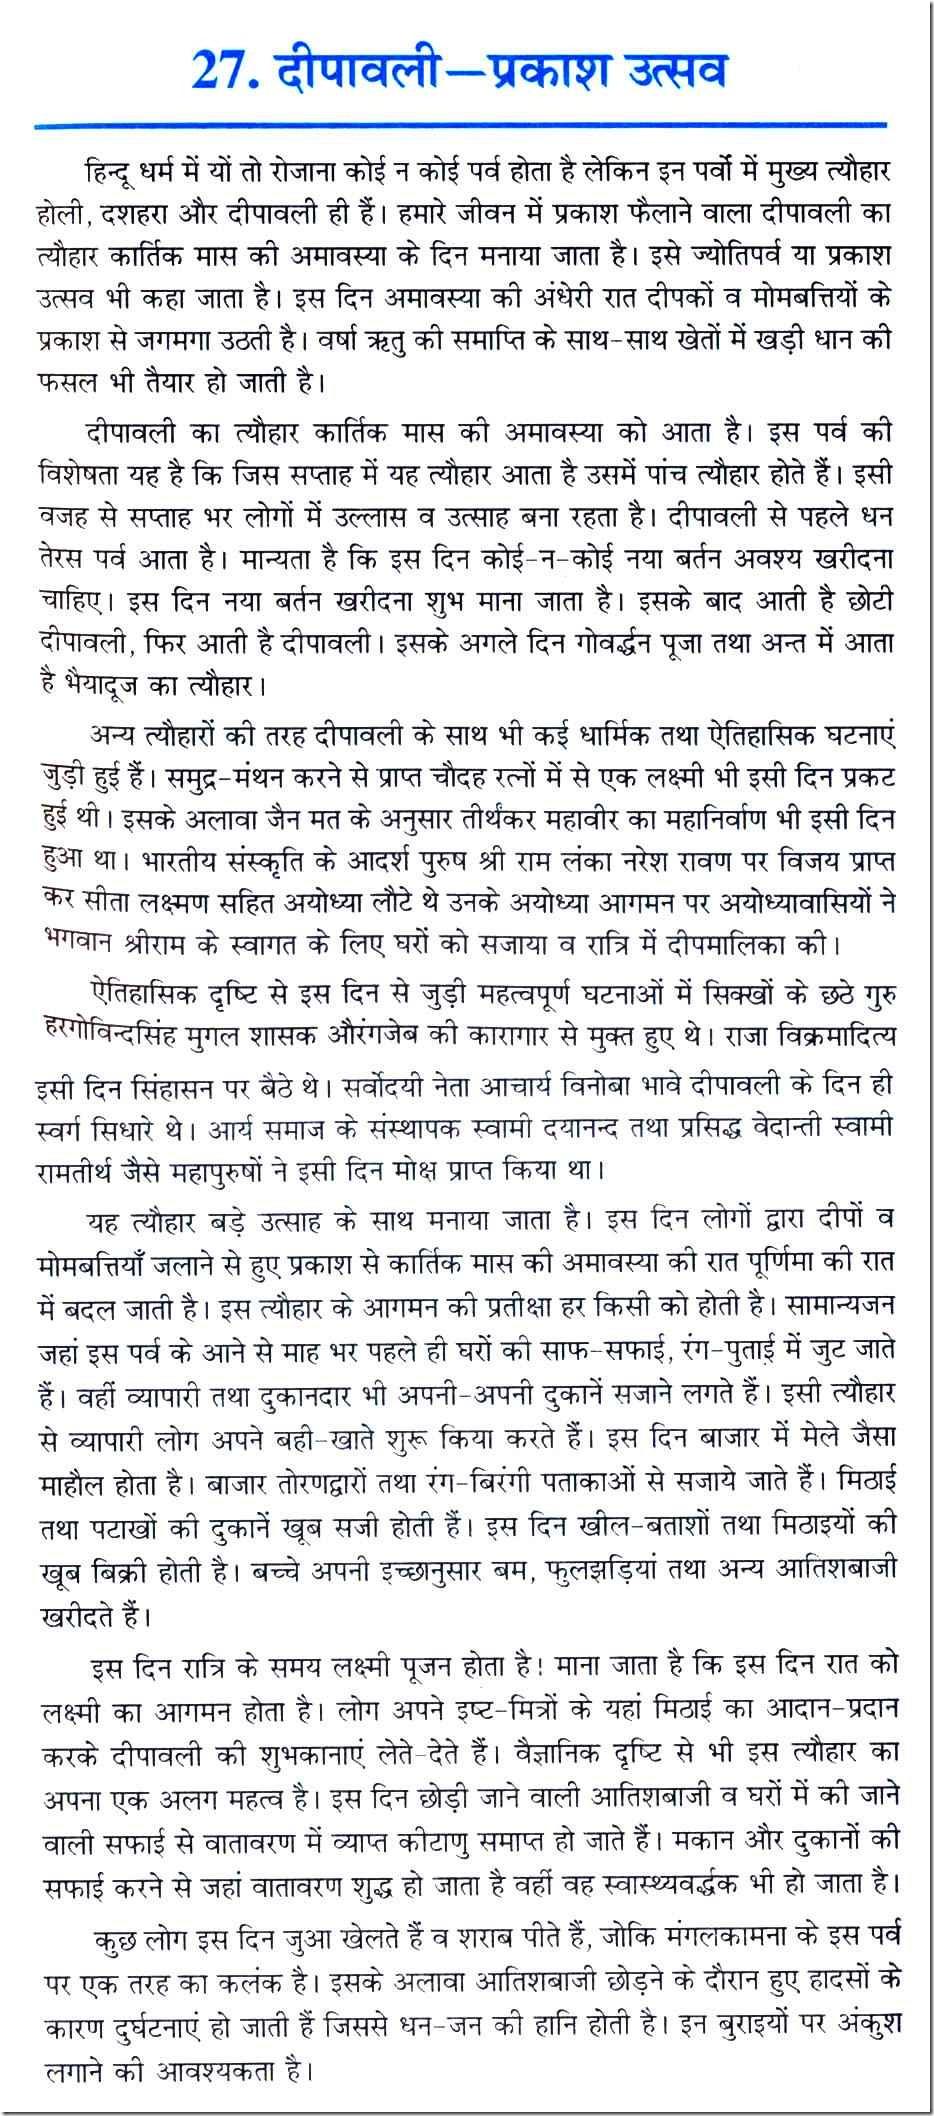 009 0020027 Thumb Essay Example For Diwali In Fantastic Hindi On 50 Words Class Short 3 Full